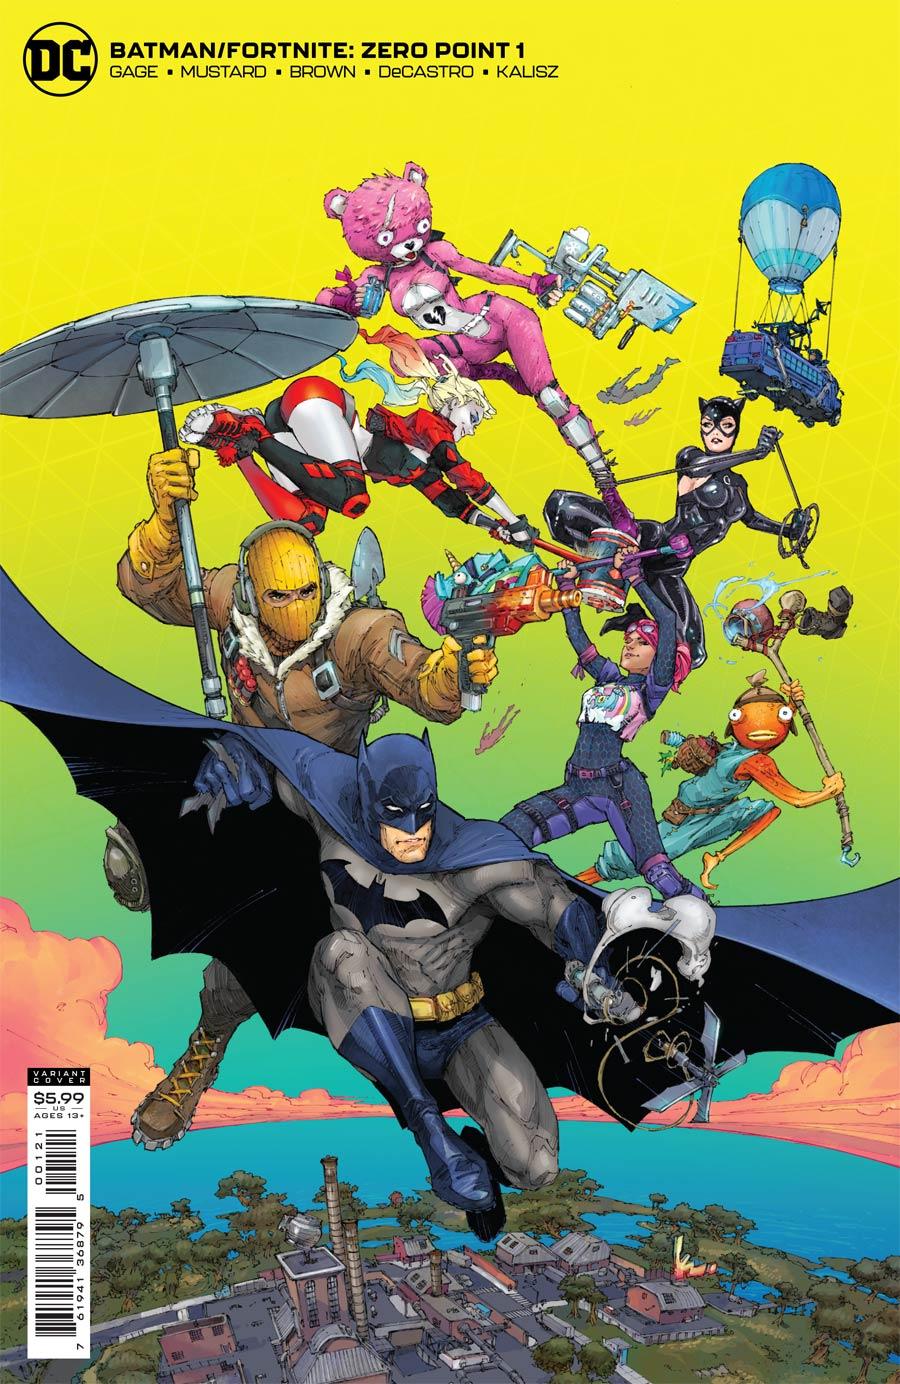 Batman Fortnite Zero Point #1 Cover B Variant Kenneth Rocafort Card Stock Cover (Limit 1 Per Customer)